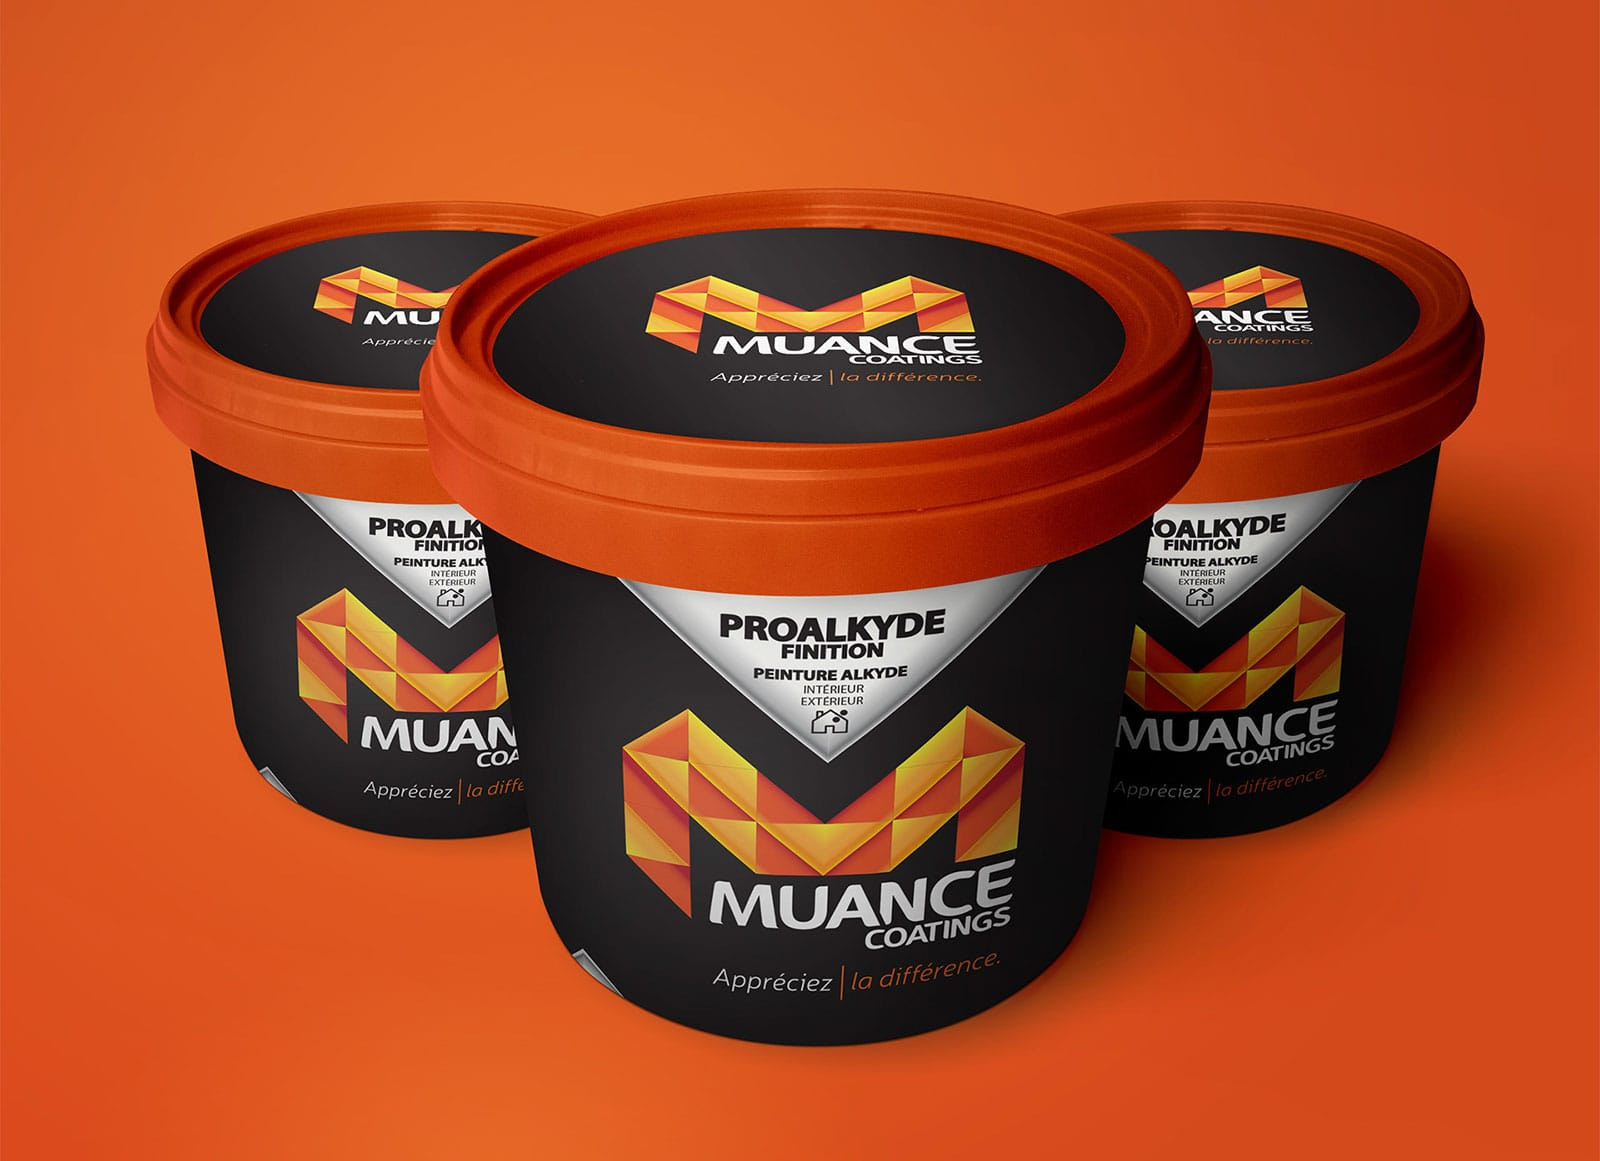 Free-Paint-Ice-Cream-Bucket-Mockup-PSD-2-min